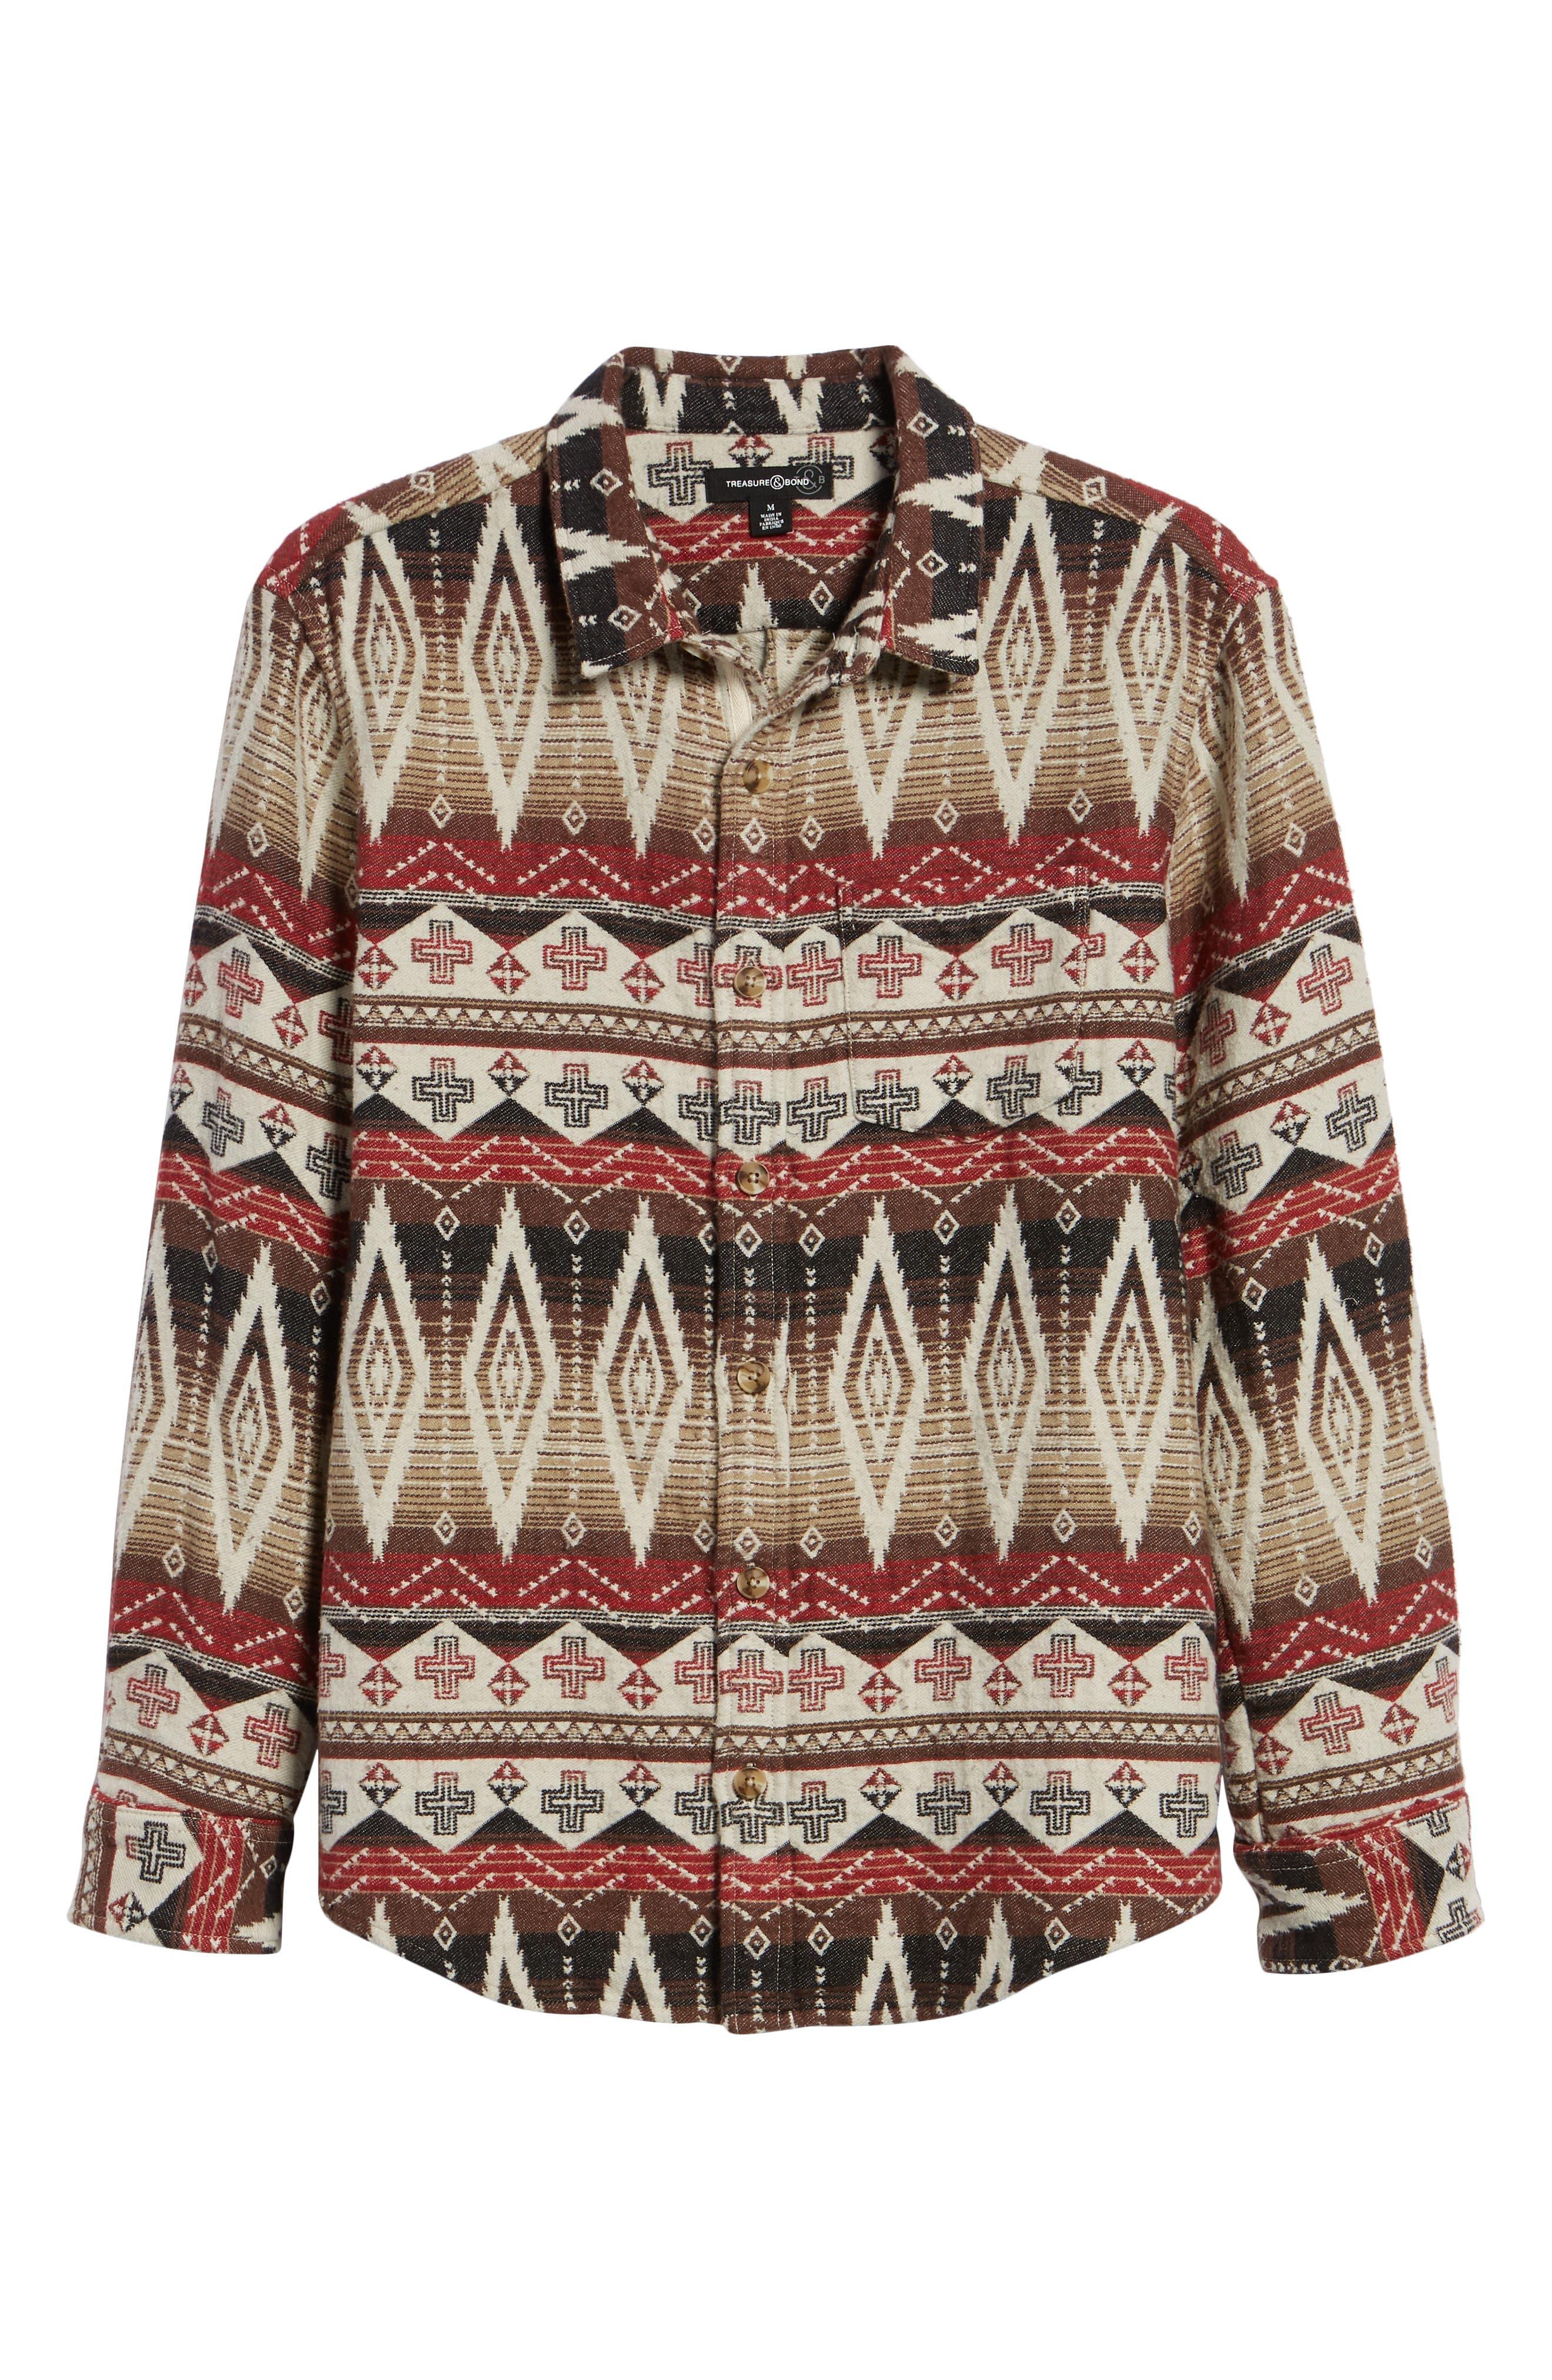 Geo Blanket Shirt Jacket,                             Alternate thumbnail 6, color,                             BEIGE RAINY DAY TRIBAL PRINT